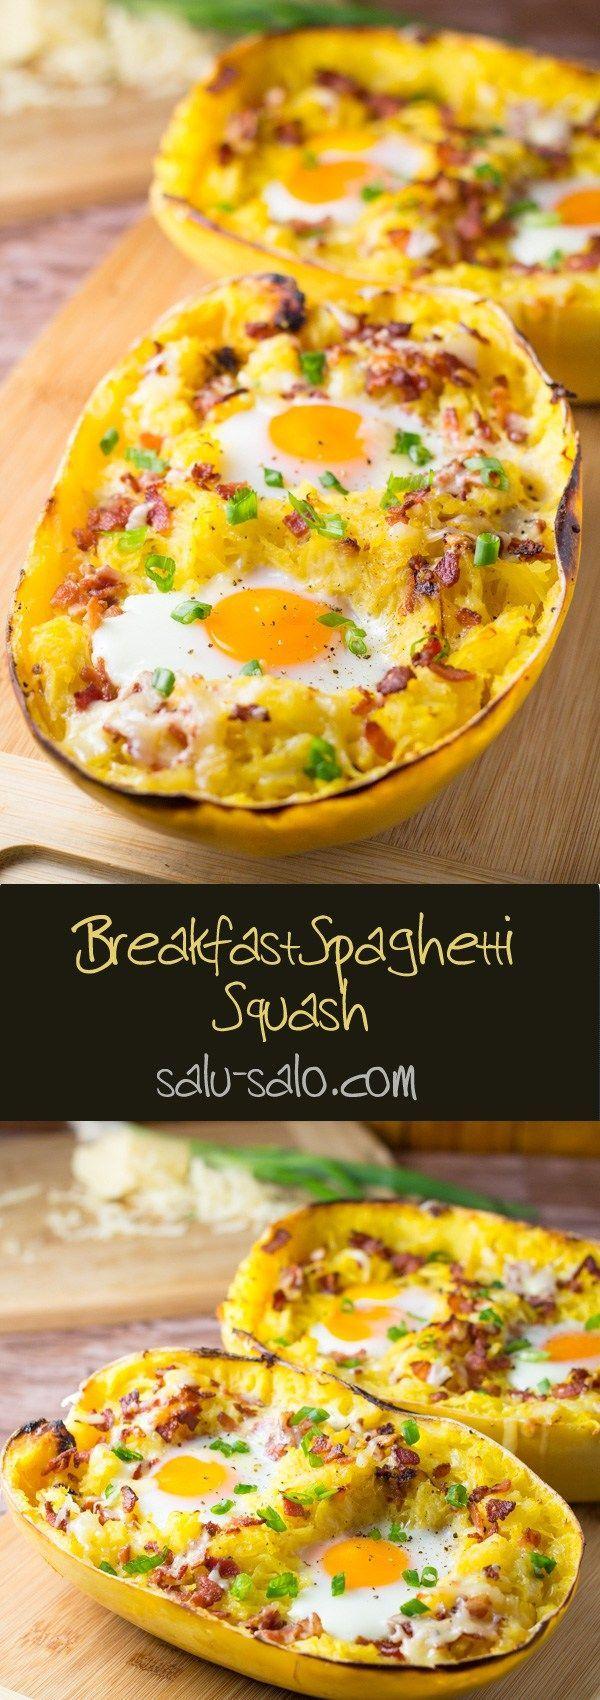 Breakfast Spaghetti Squash